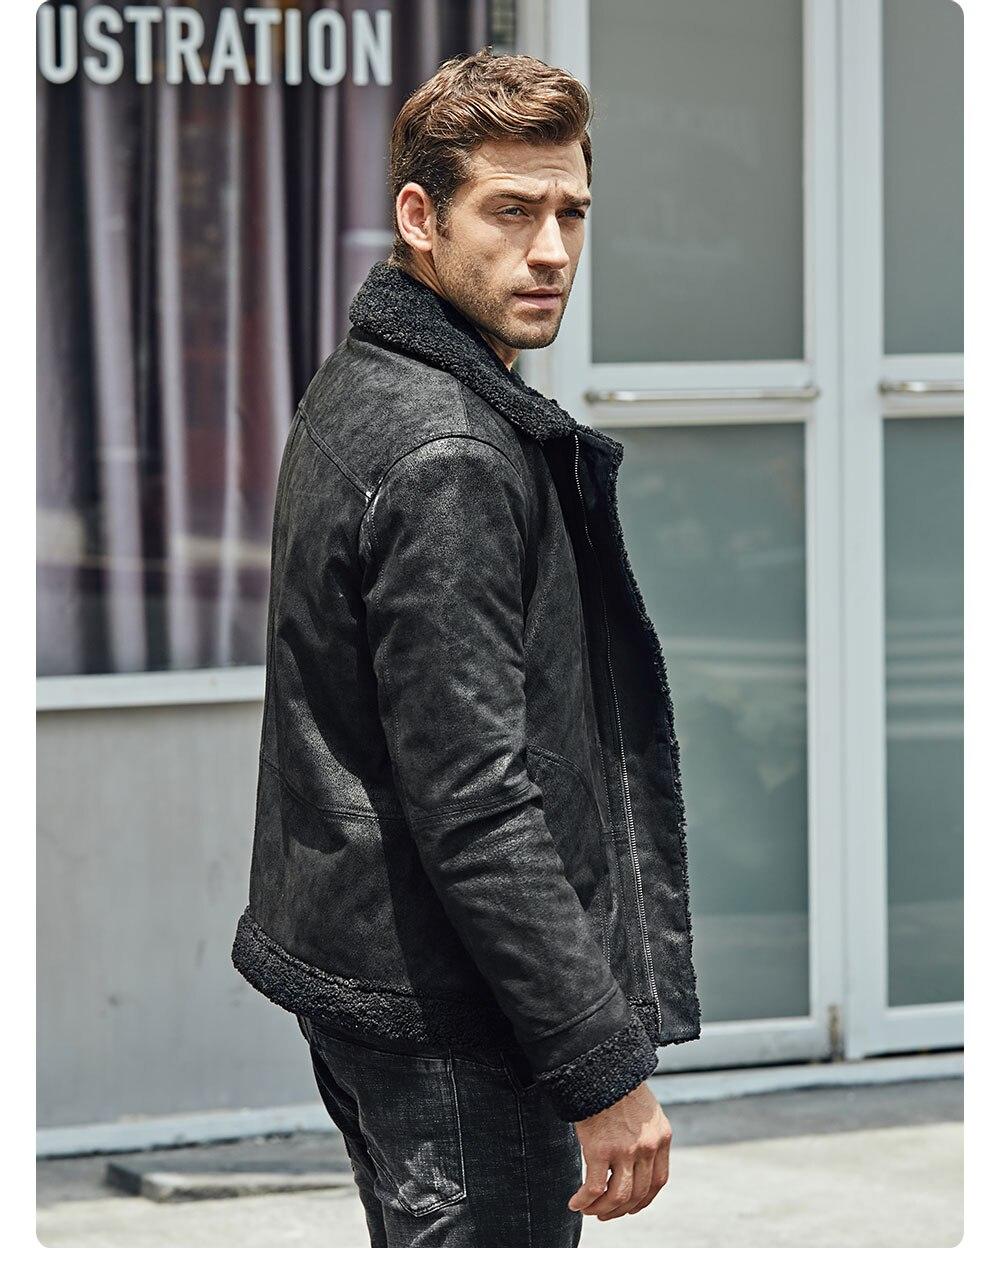 Hed5879fc7f55487395a765da1f021c4fN New Men's Real Leather Jacket Faux Fur Collar Genuine Leather Jacket